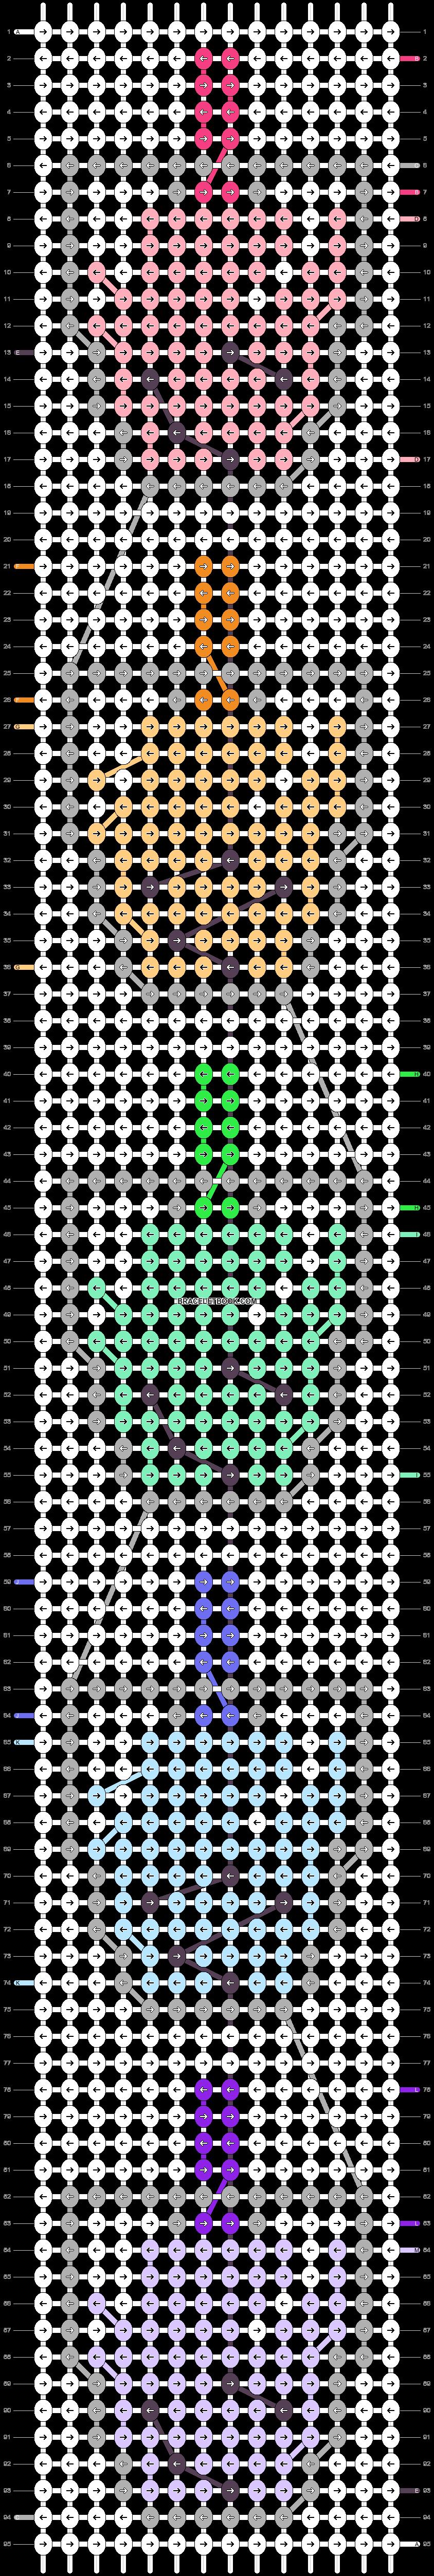 Alpha pattern #46834 pattern